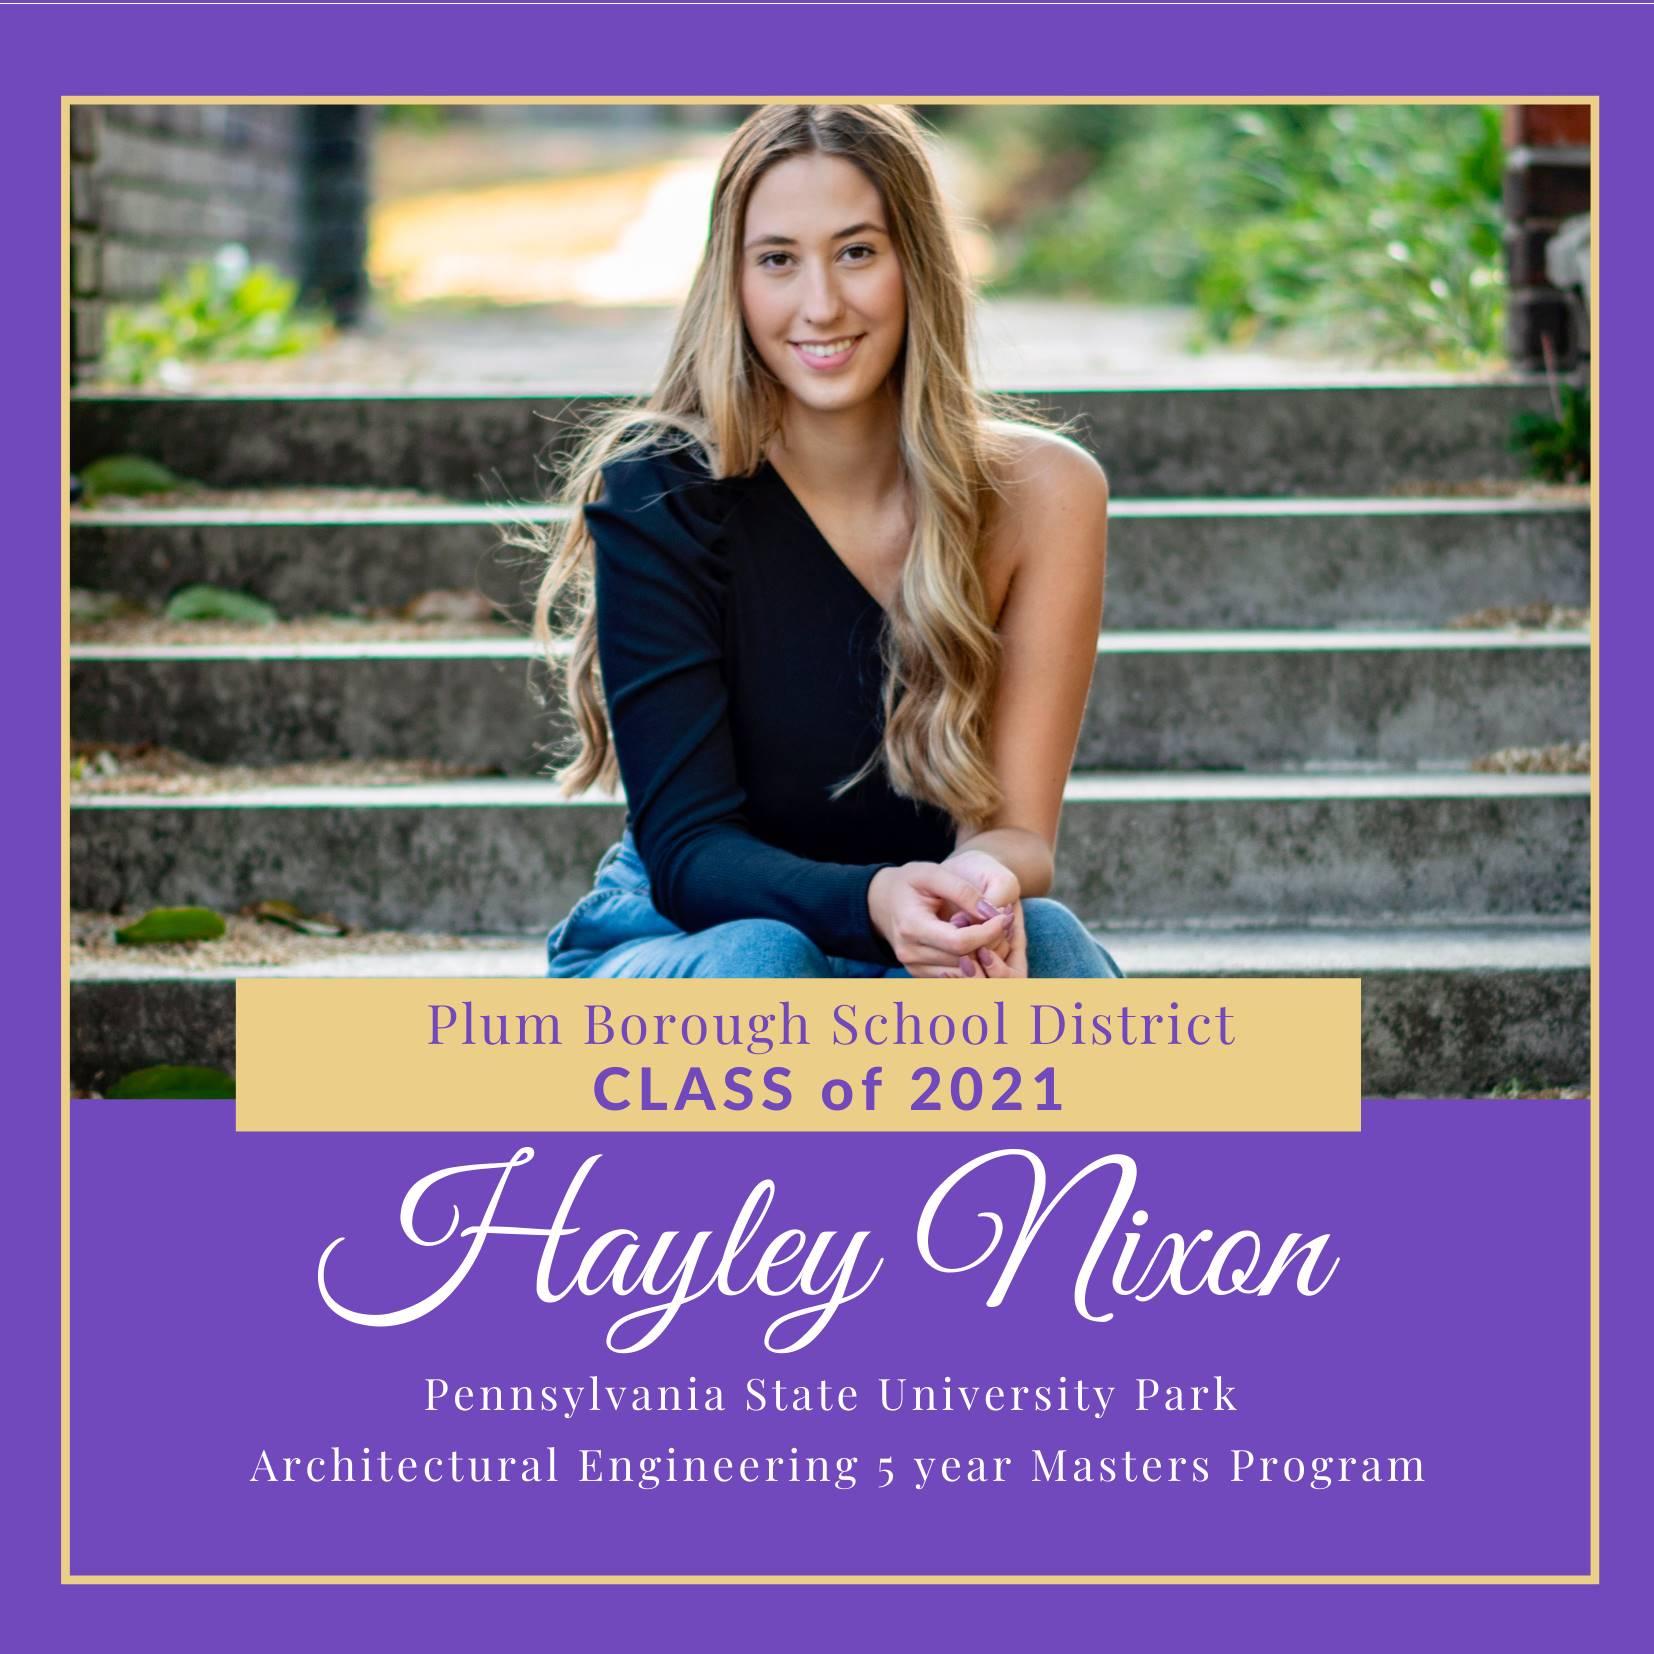 Congratulations to Hayley Nixon, Class of 2021!